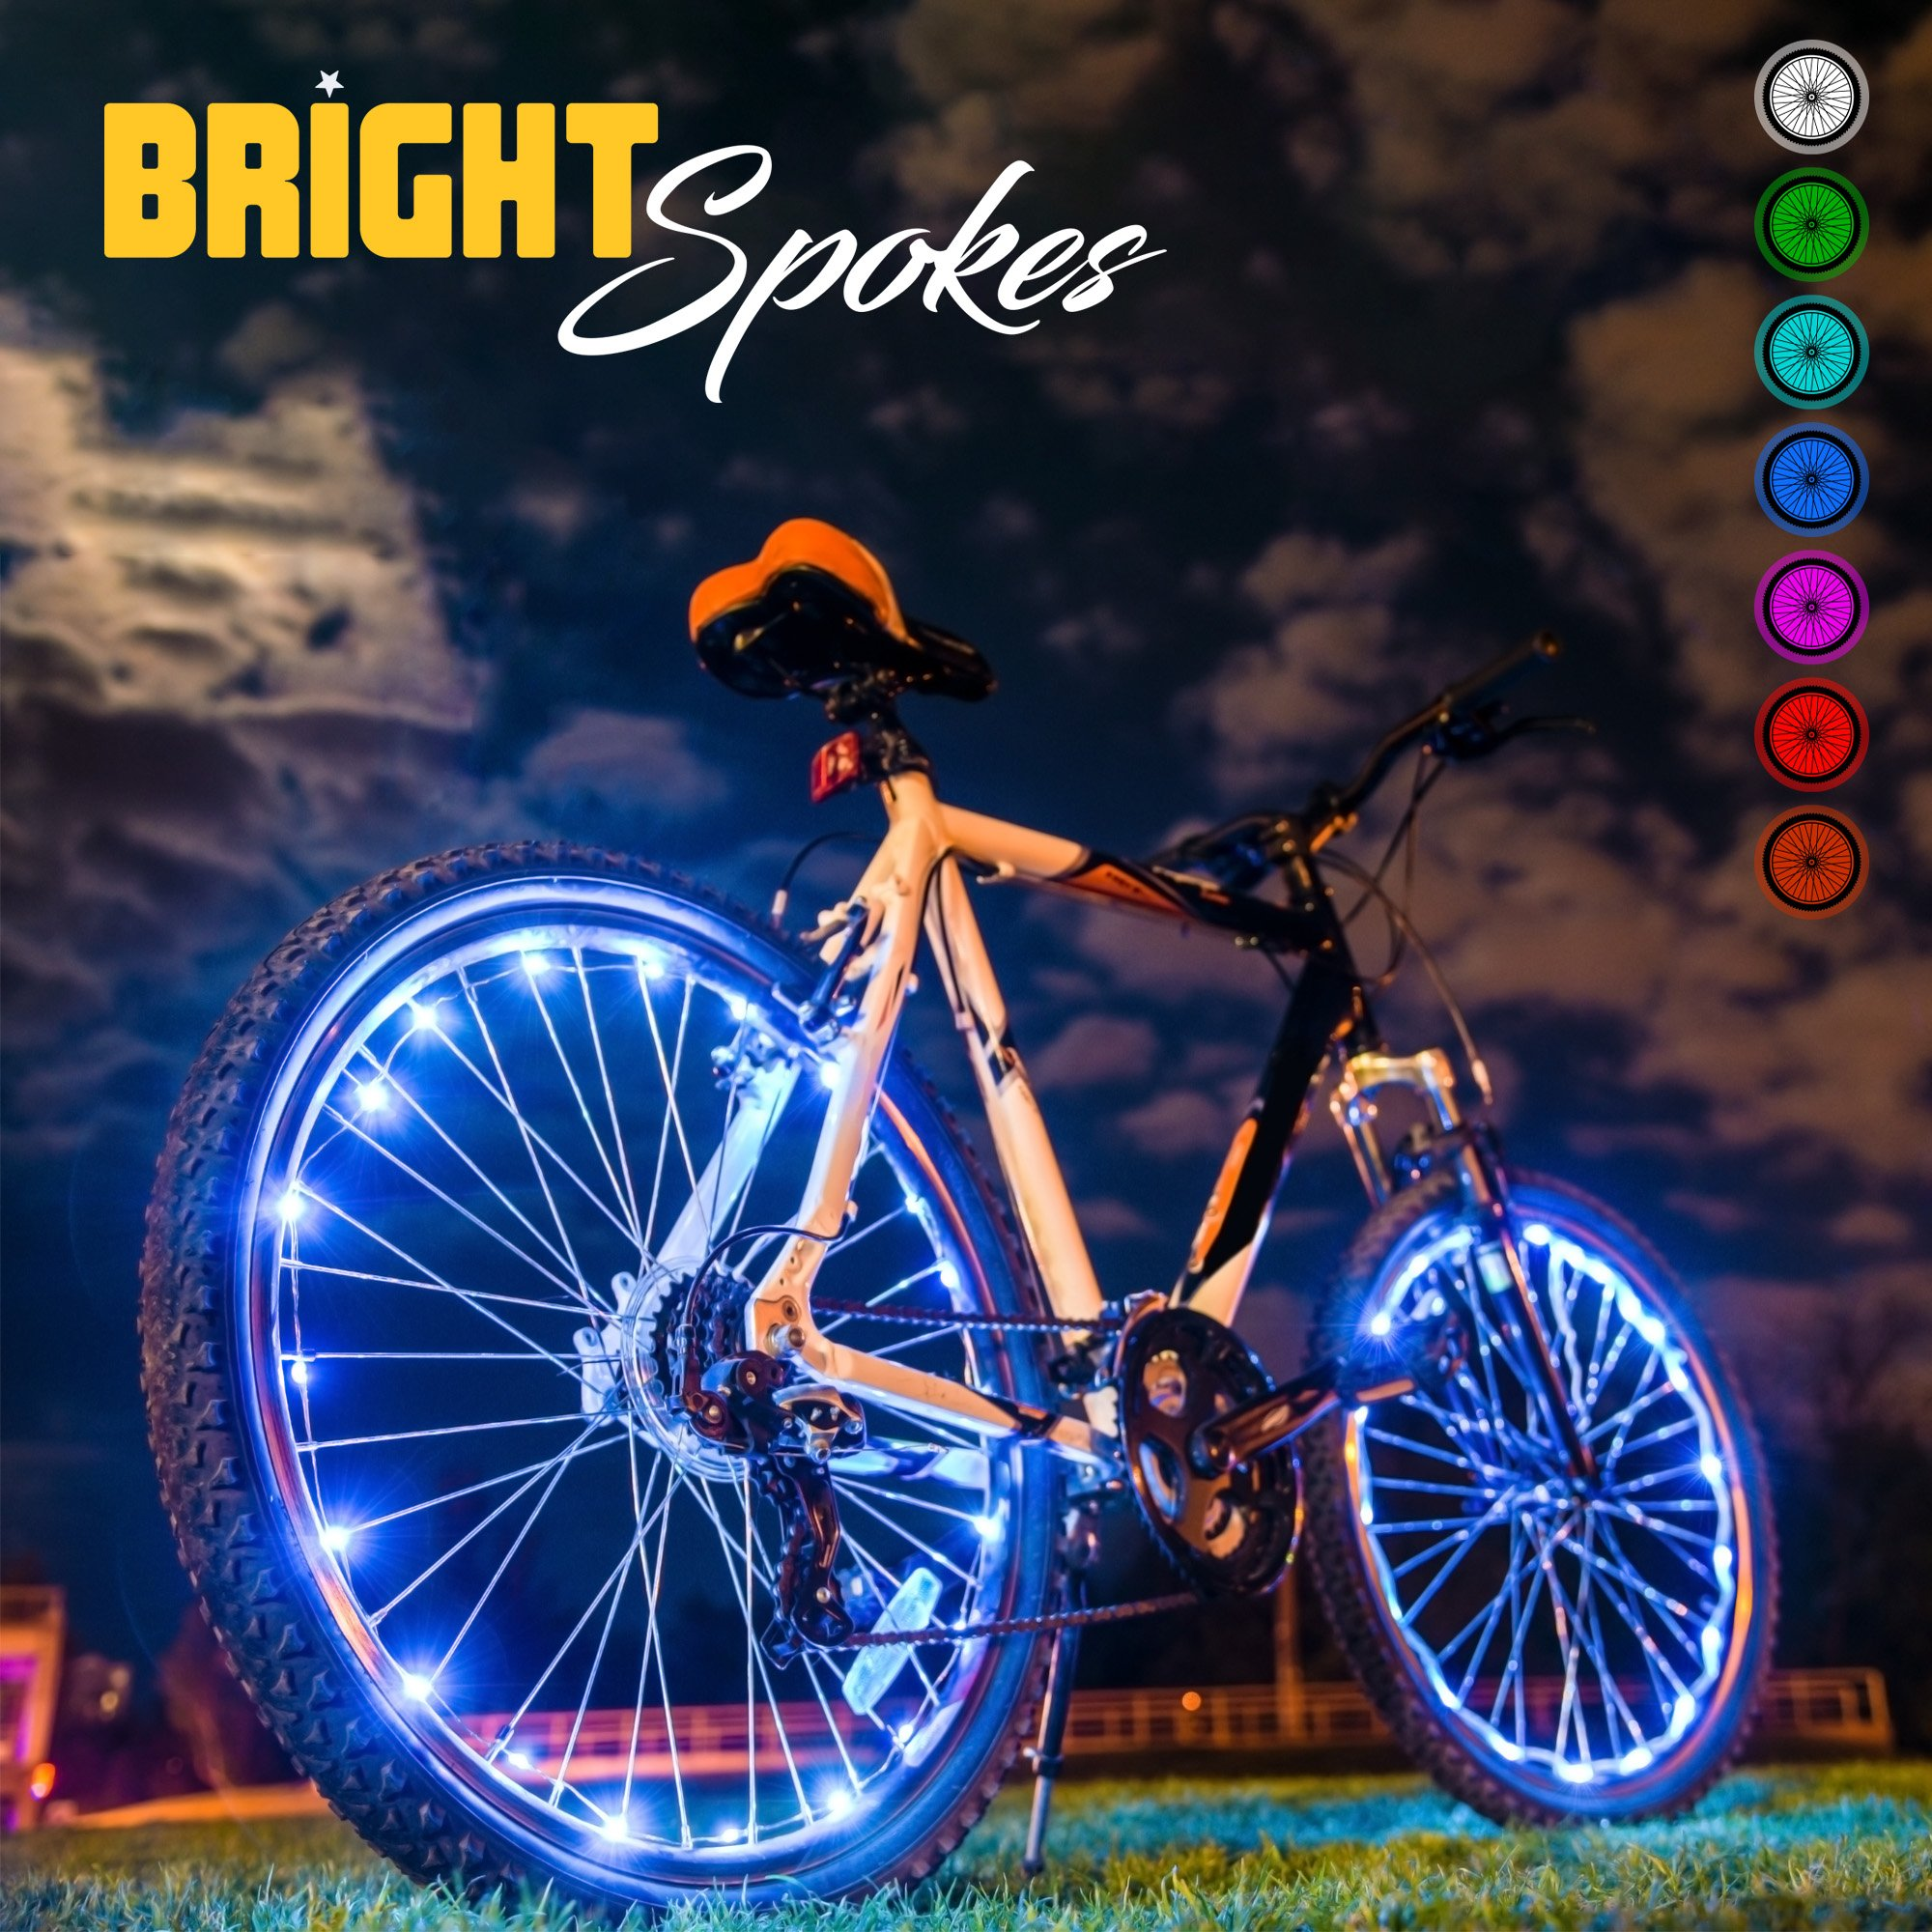 Bright Spokes - Luces LED para rueda de bicicleta, 7 colores en 1 ...